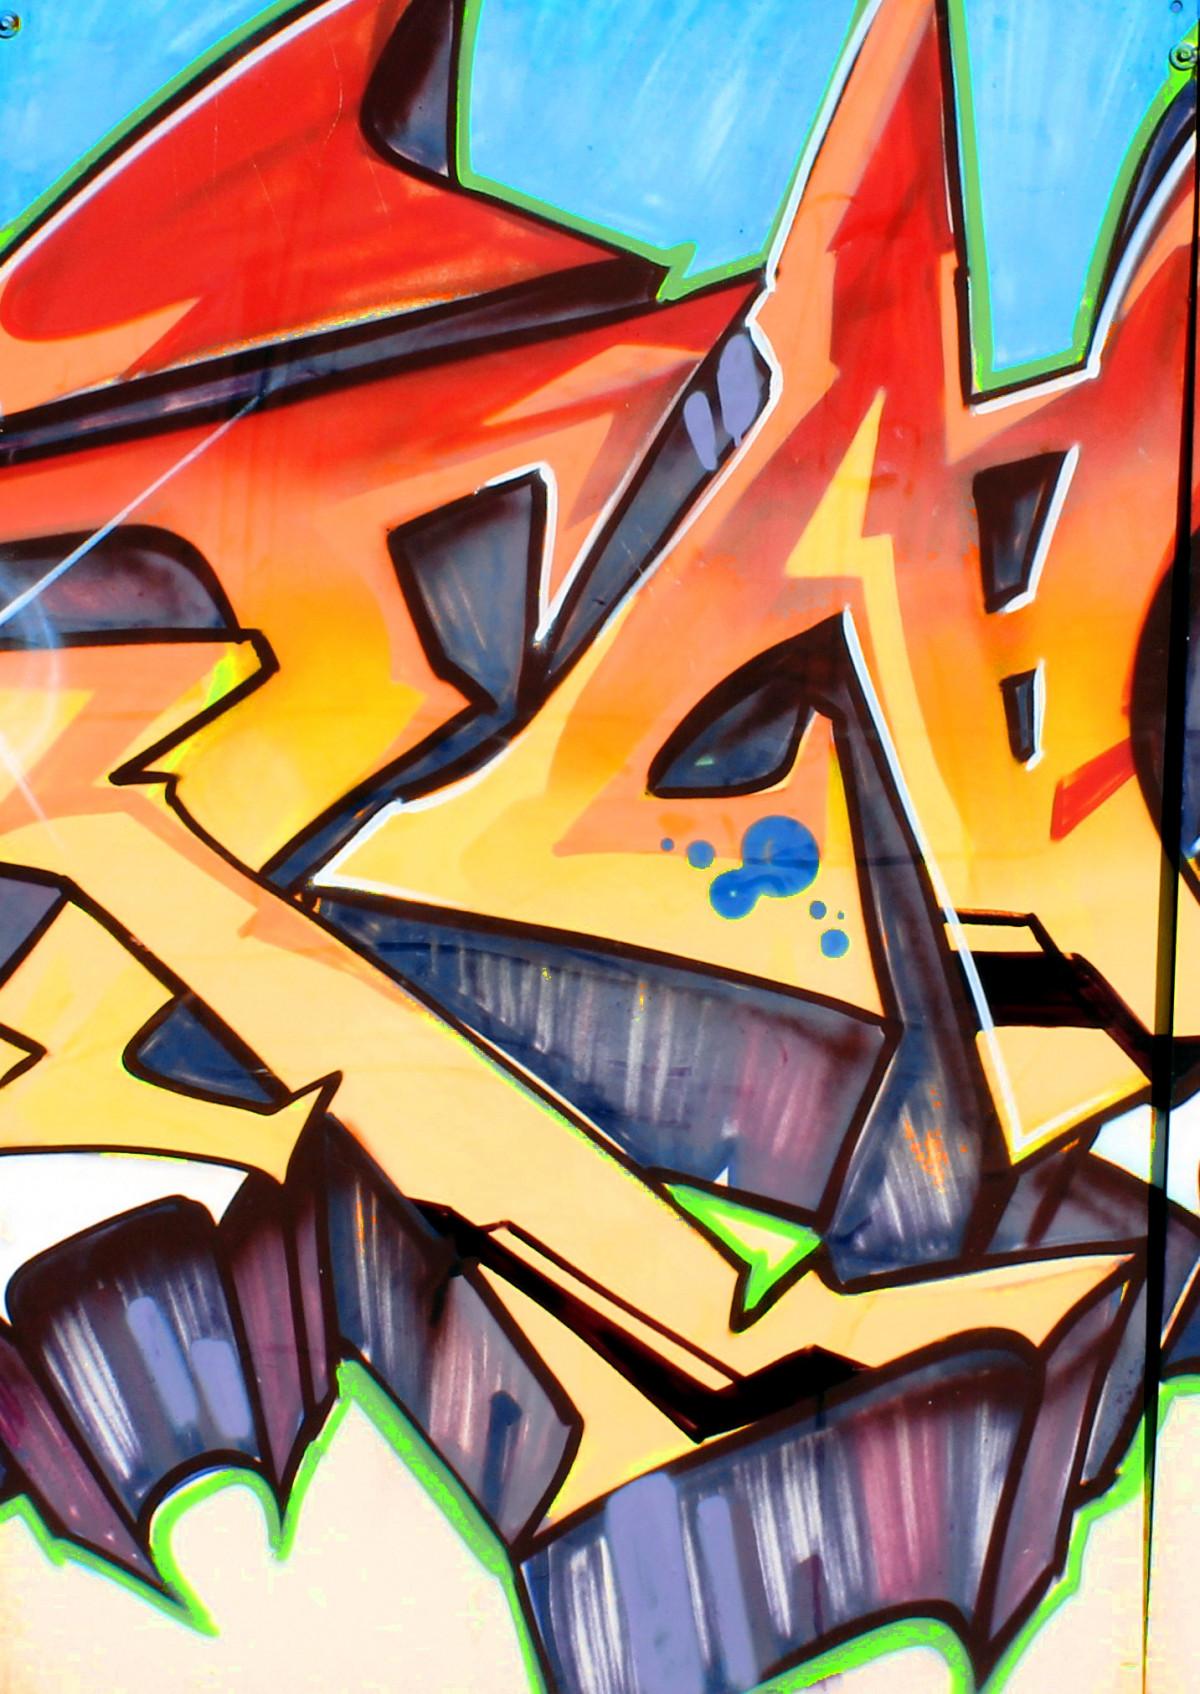 Free Images : spray, paint, grunge, street art, illustration ...